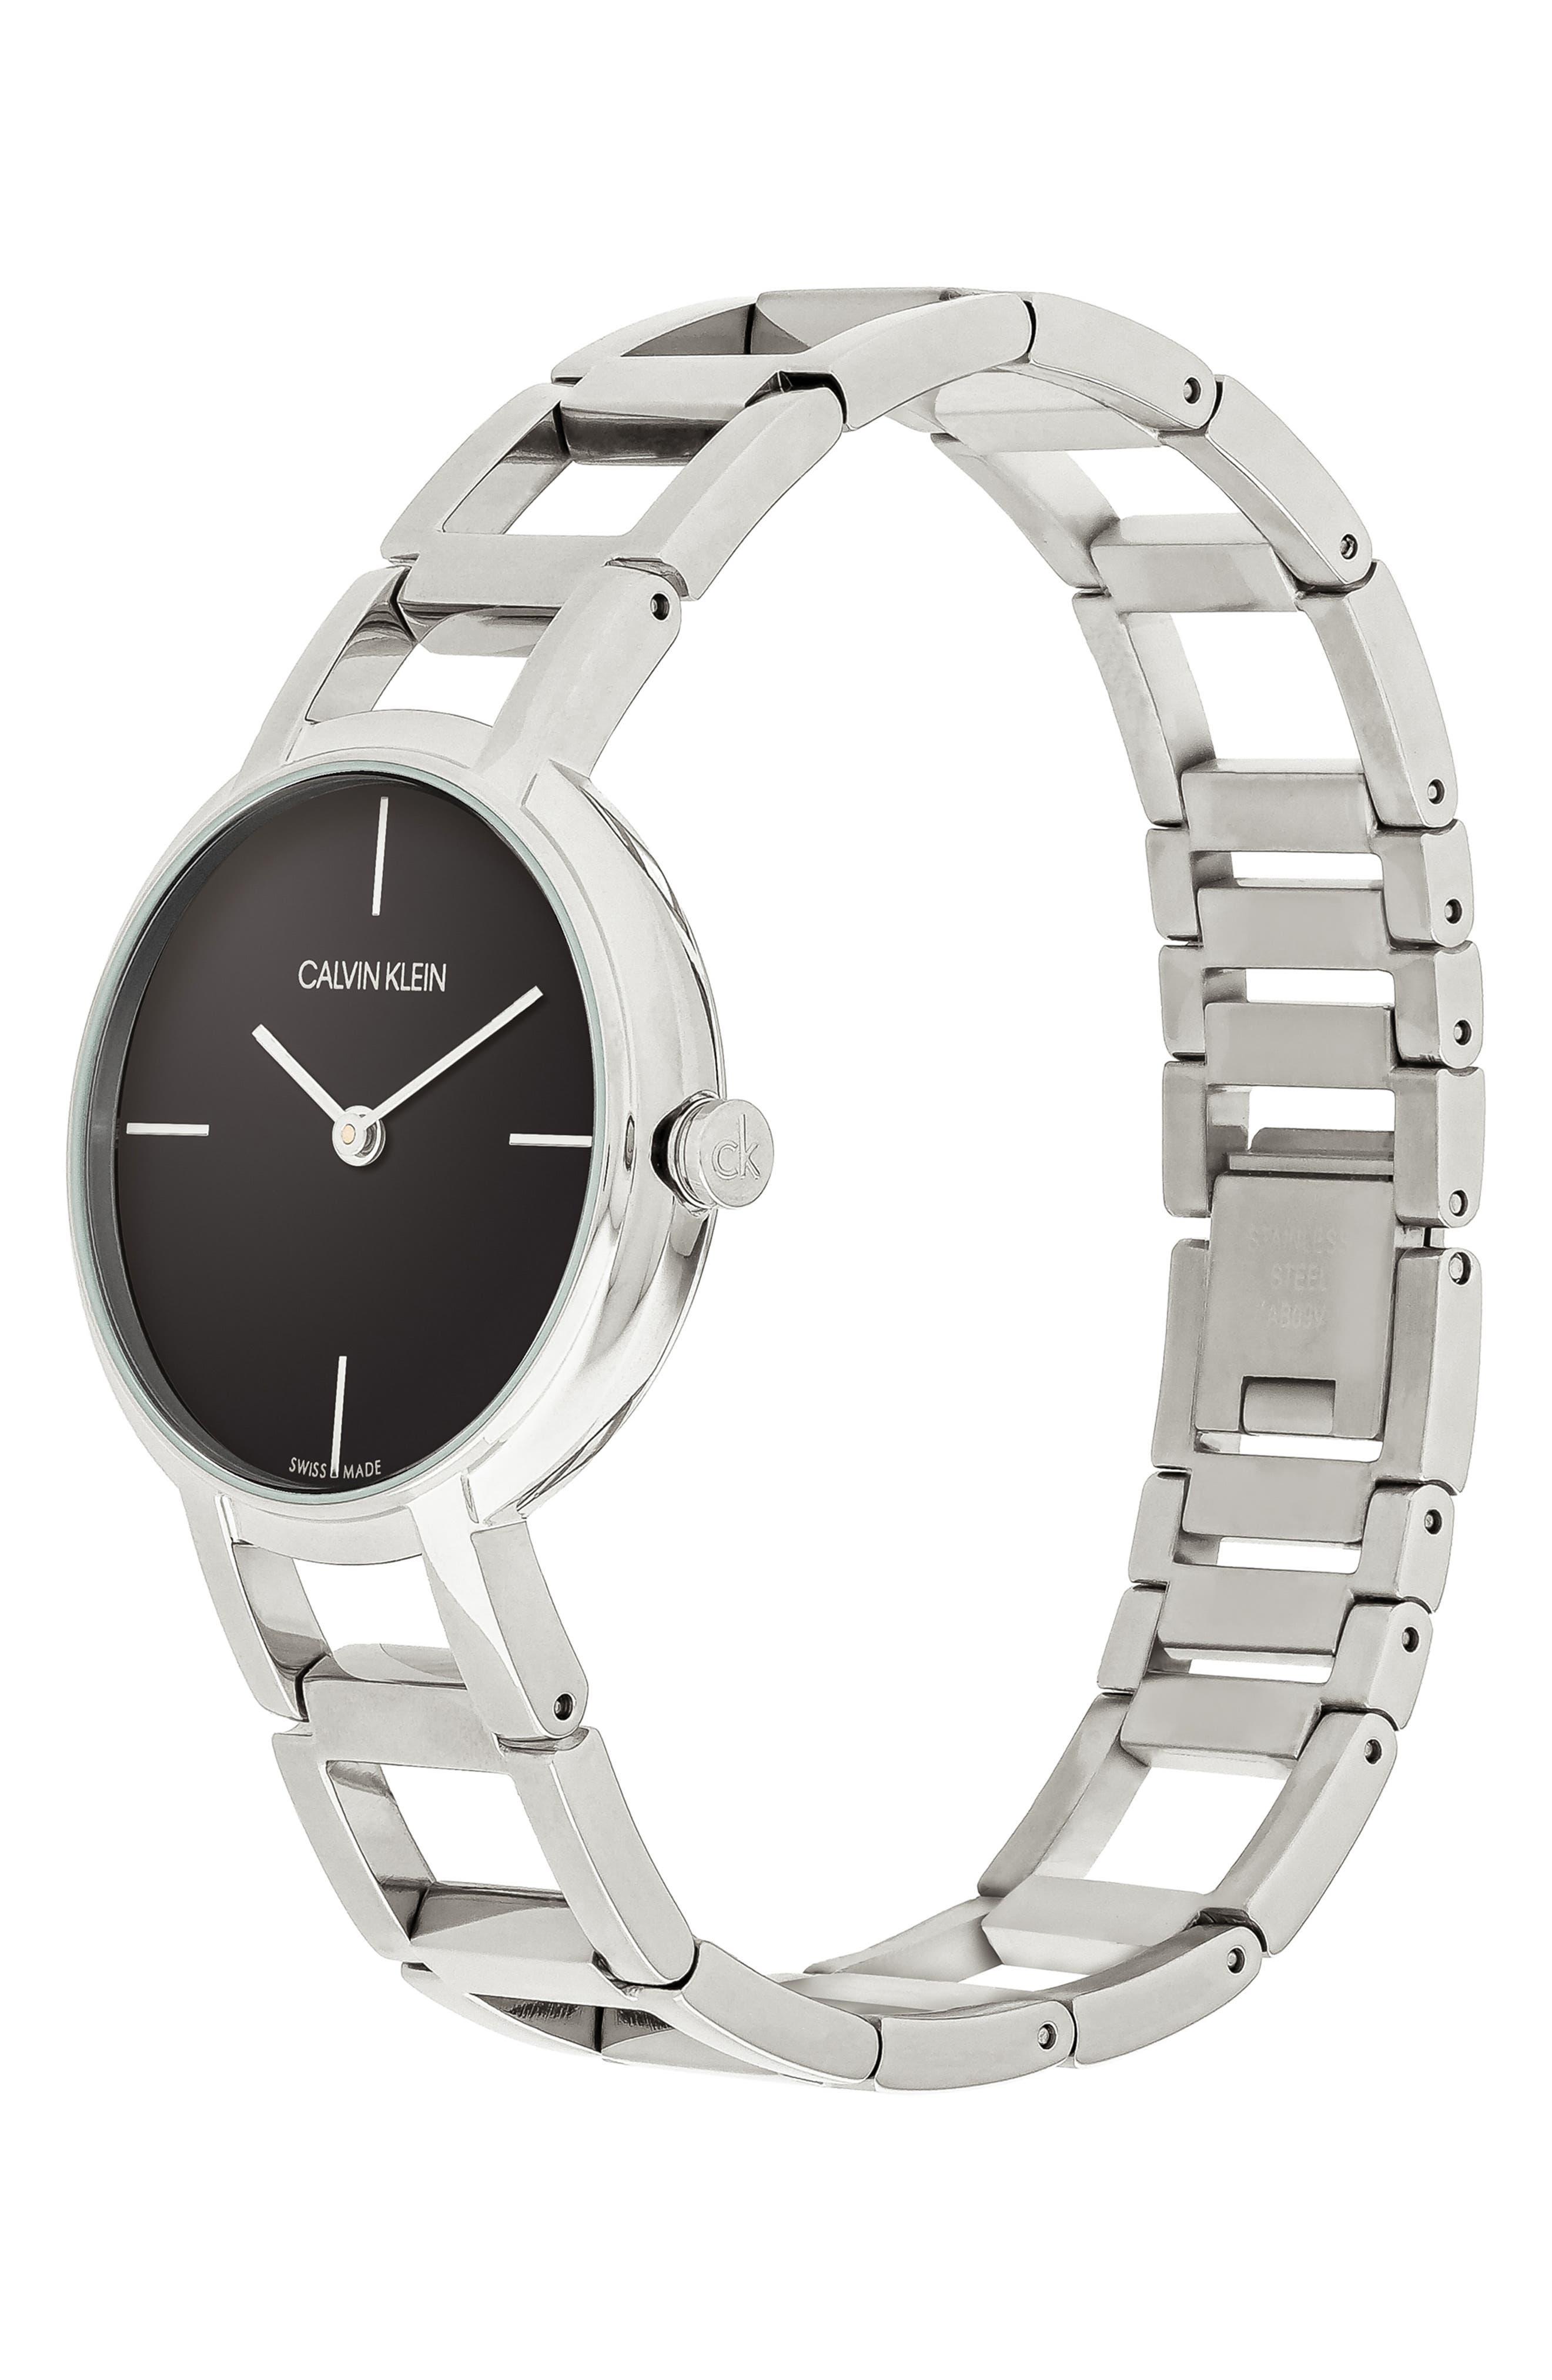 CALVIN KLEIN, Cheers Bracelet Watch, 32mm, Alternate thumbnail 4, color, SILVER/ BLACK/ SILVER